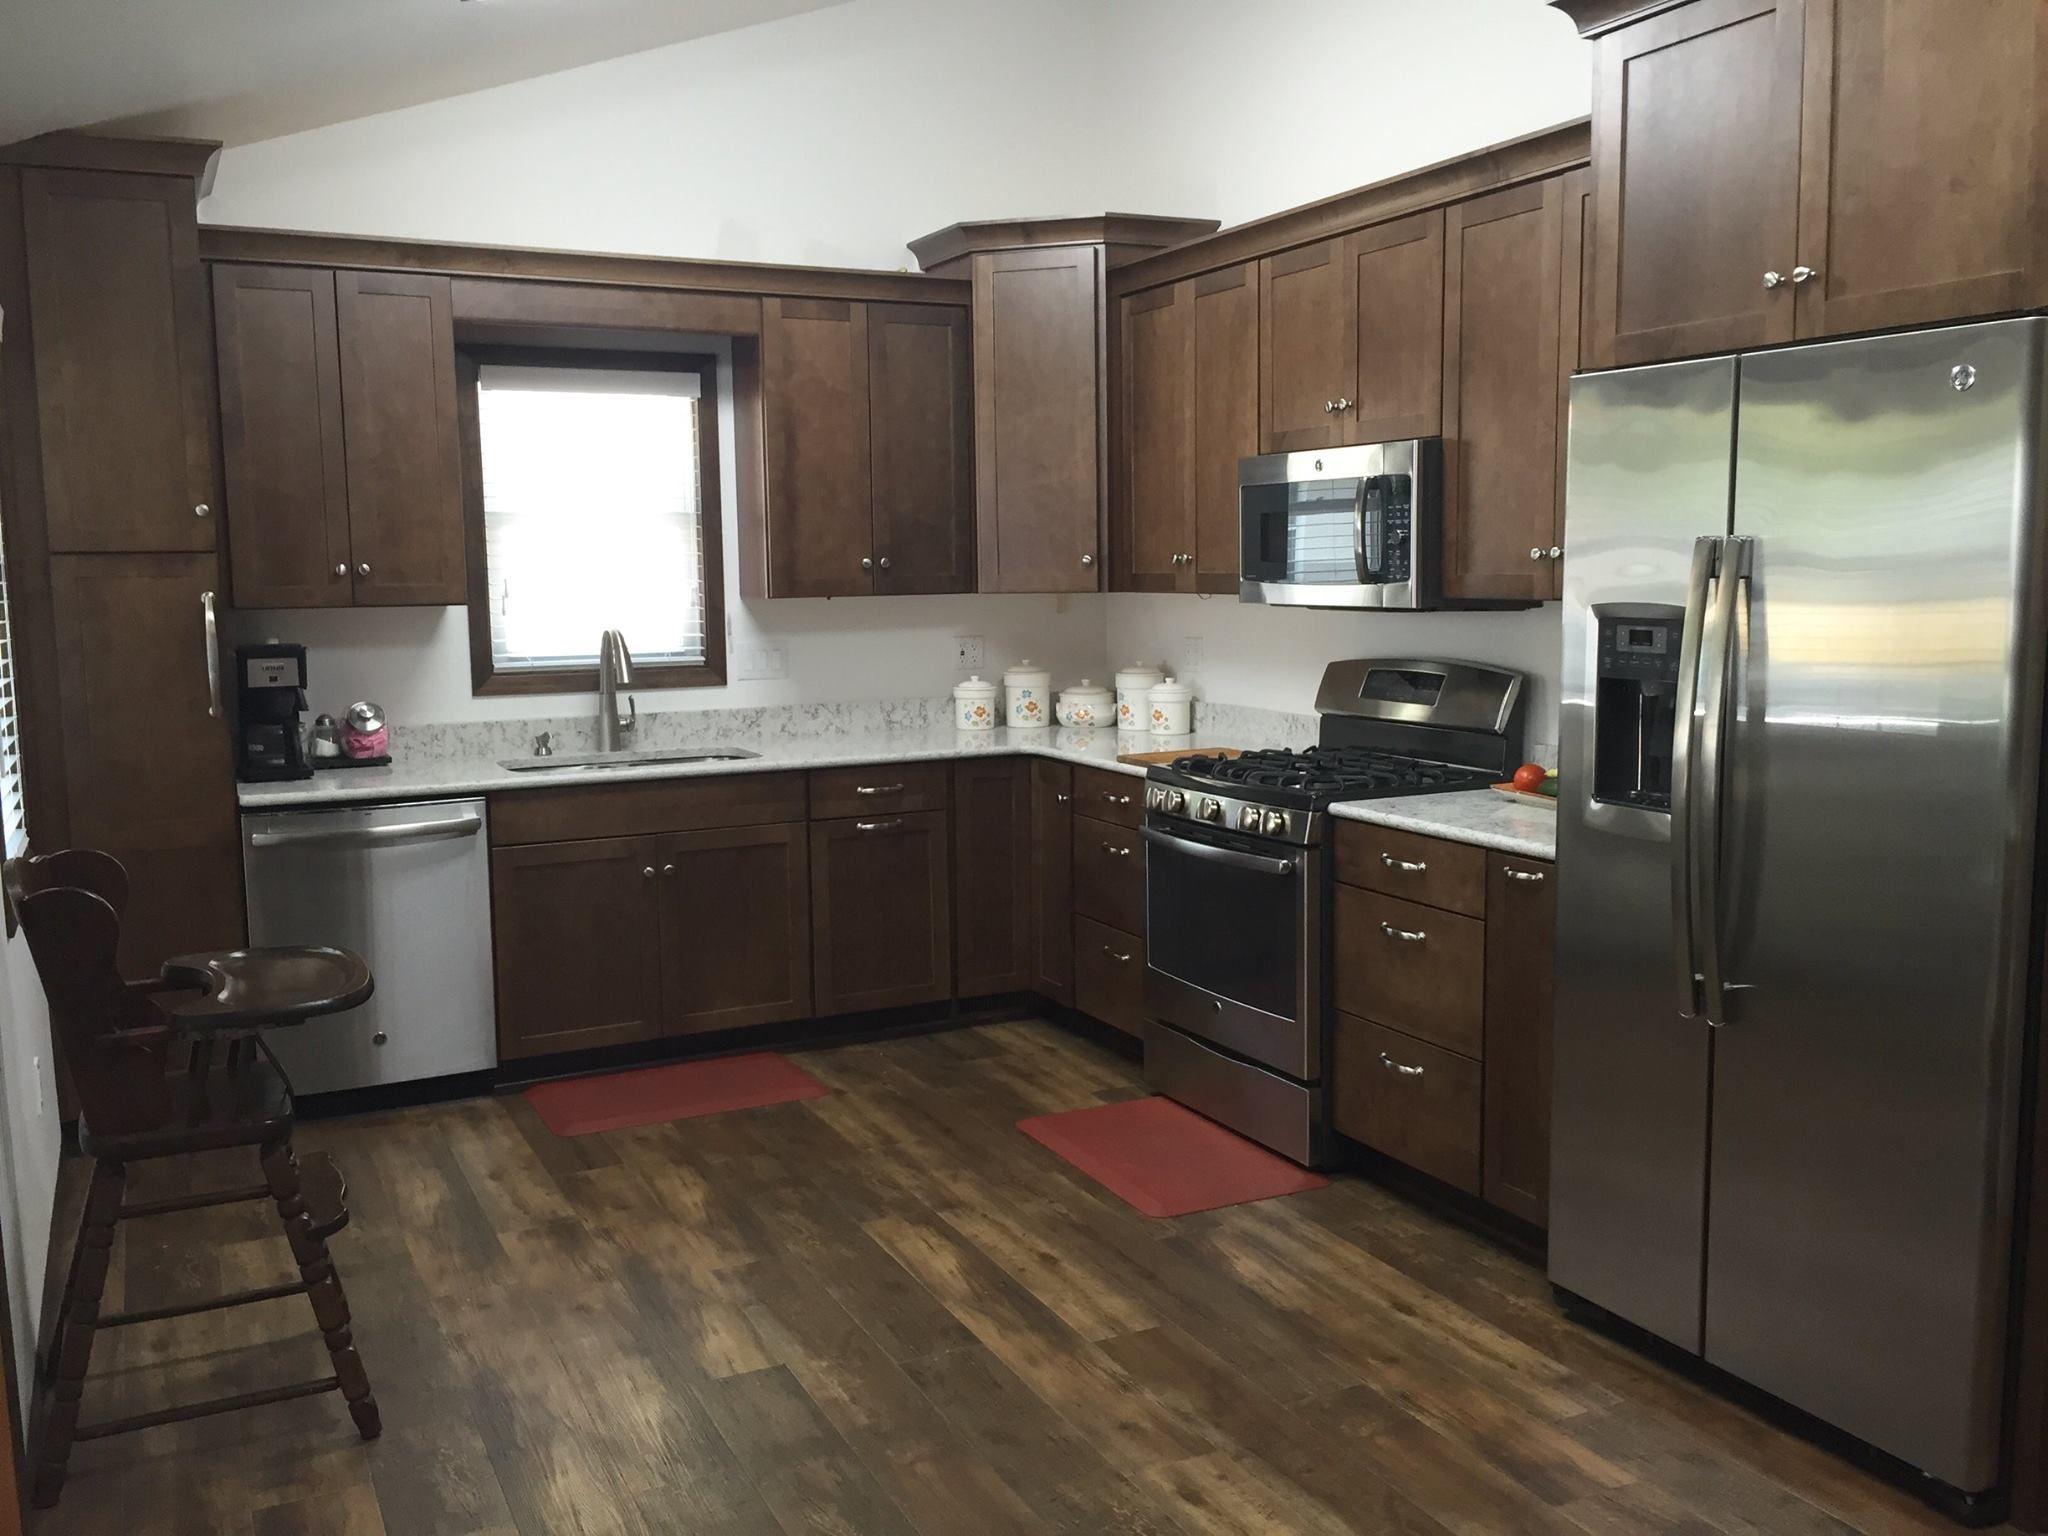 Concord Maple Fireside Kitchen Cabinets Home Decor Cabinet